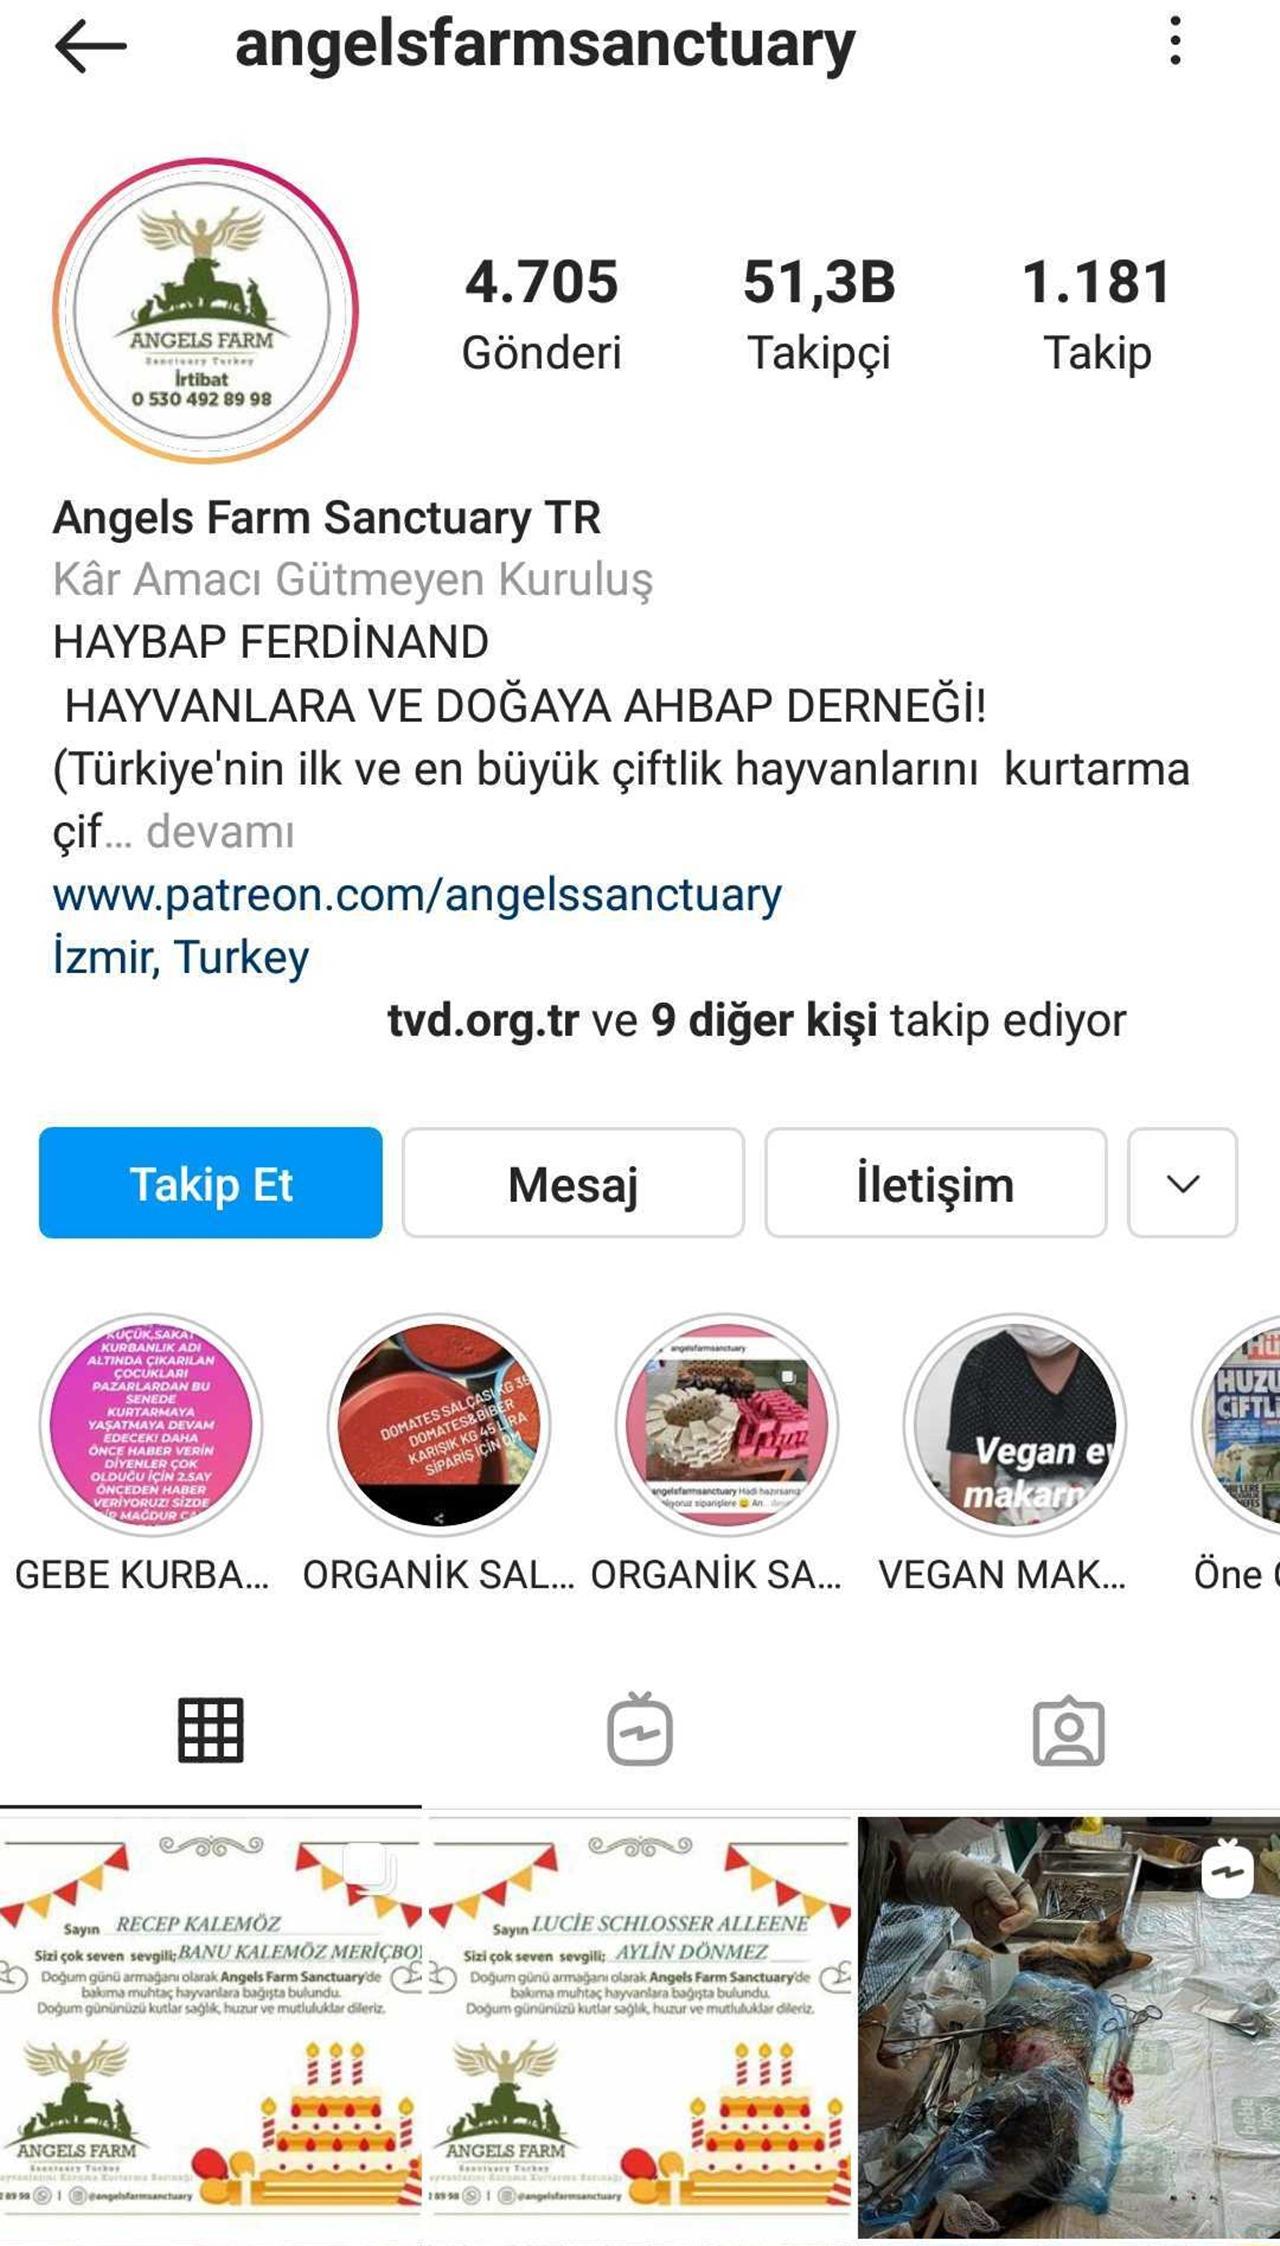 angels farm